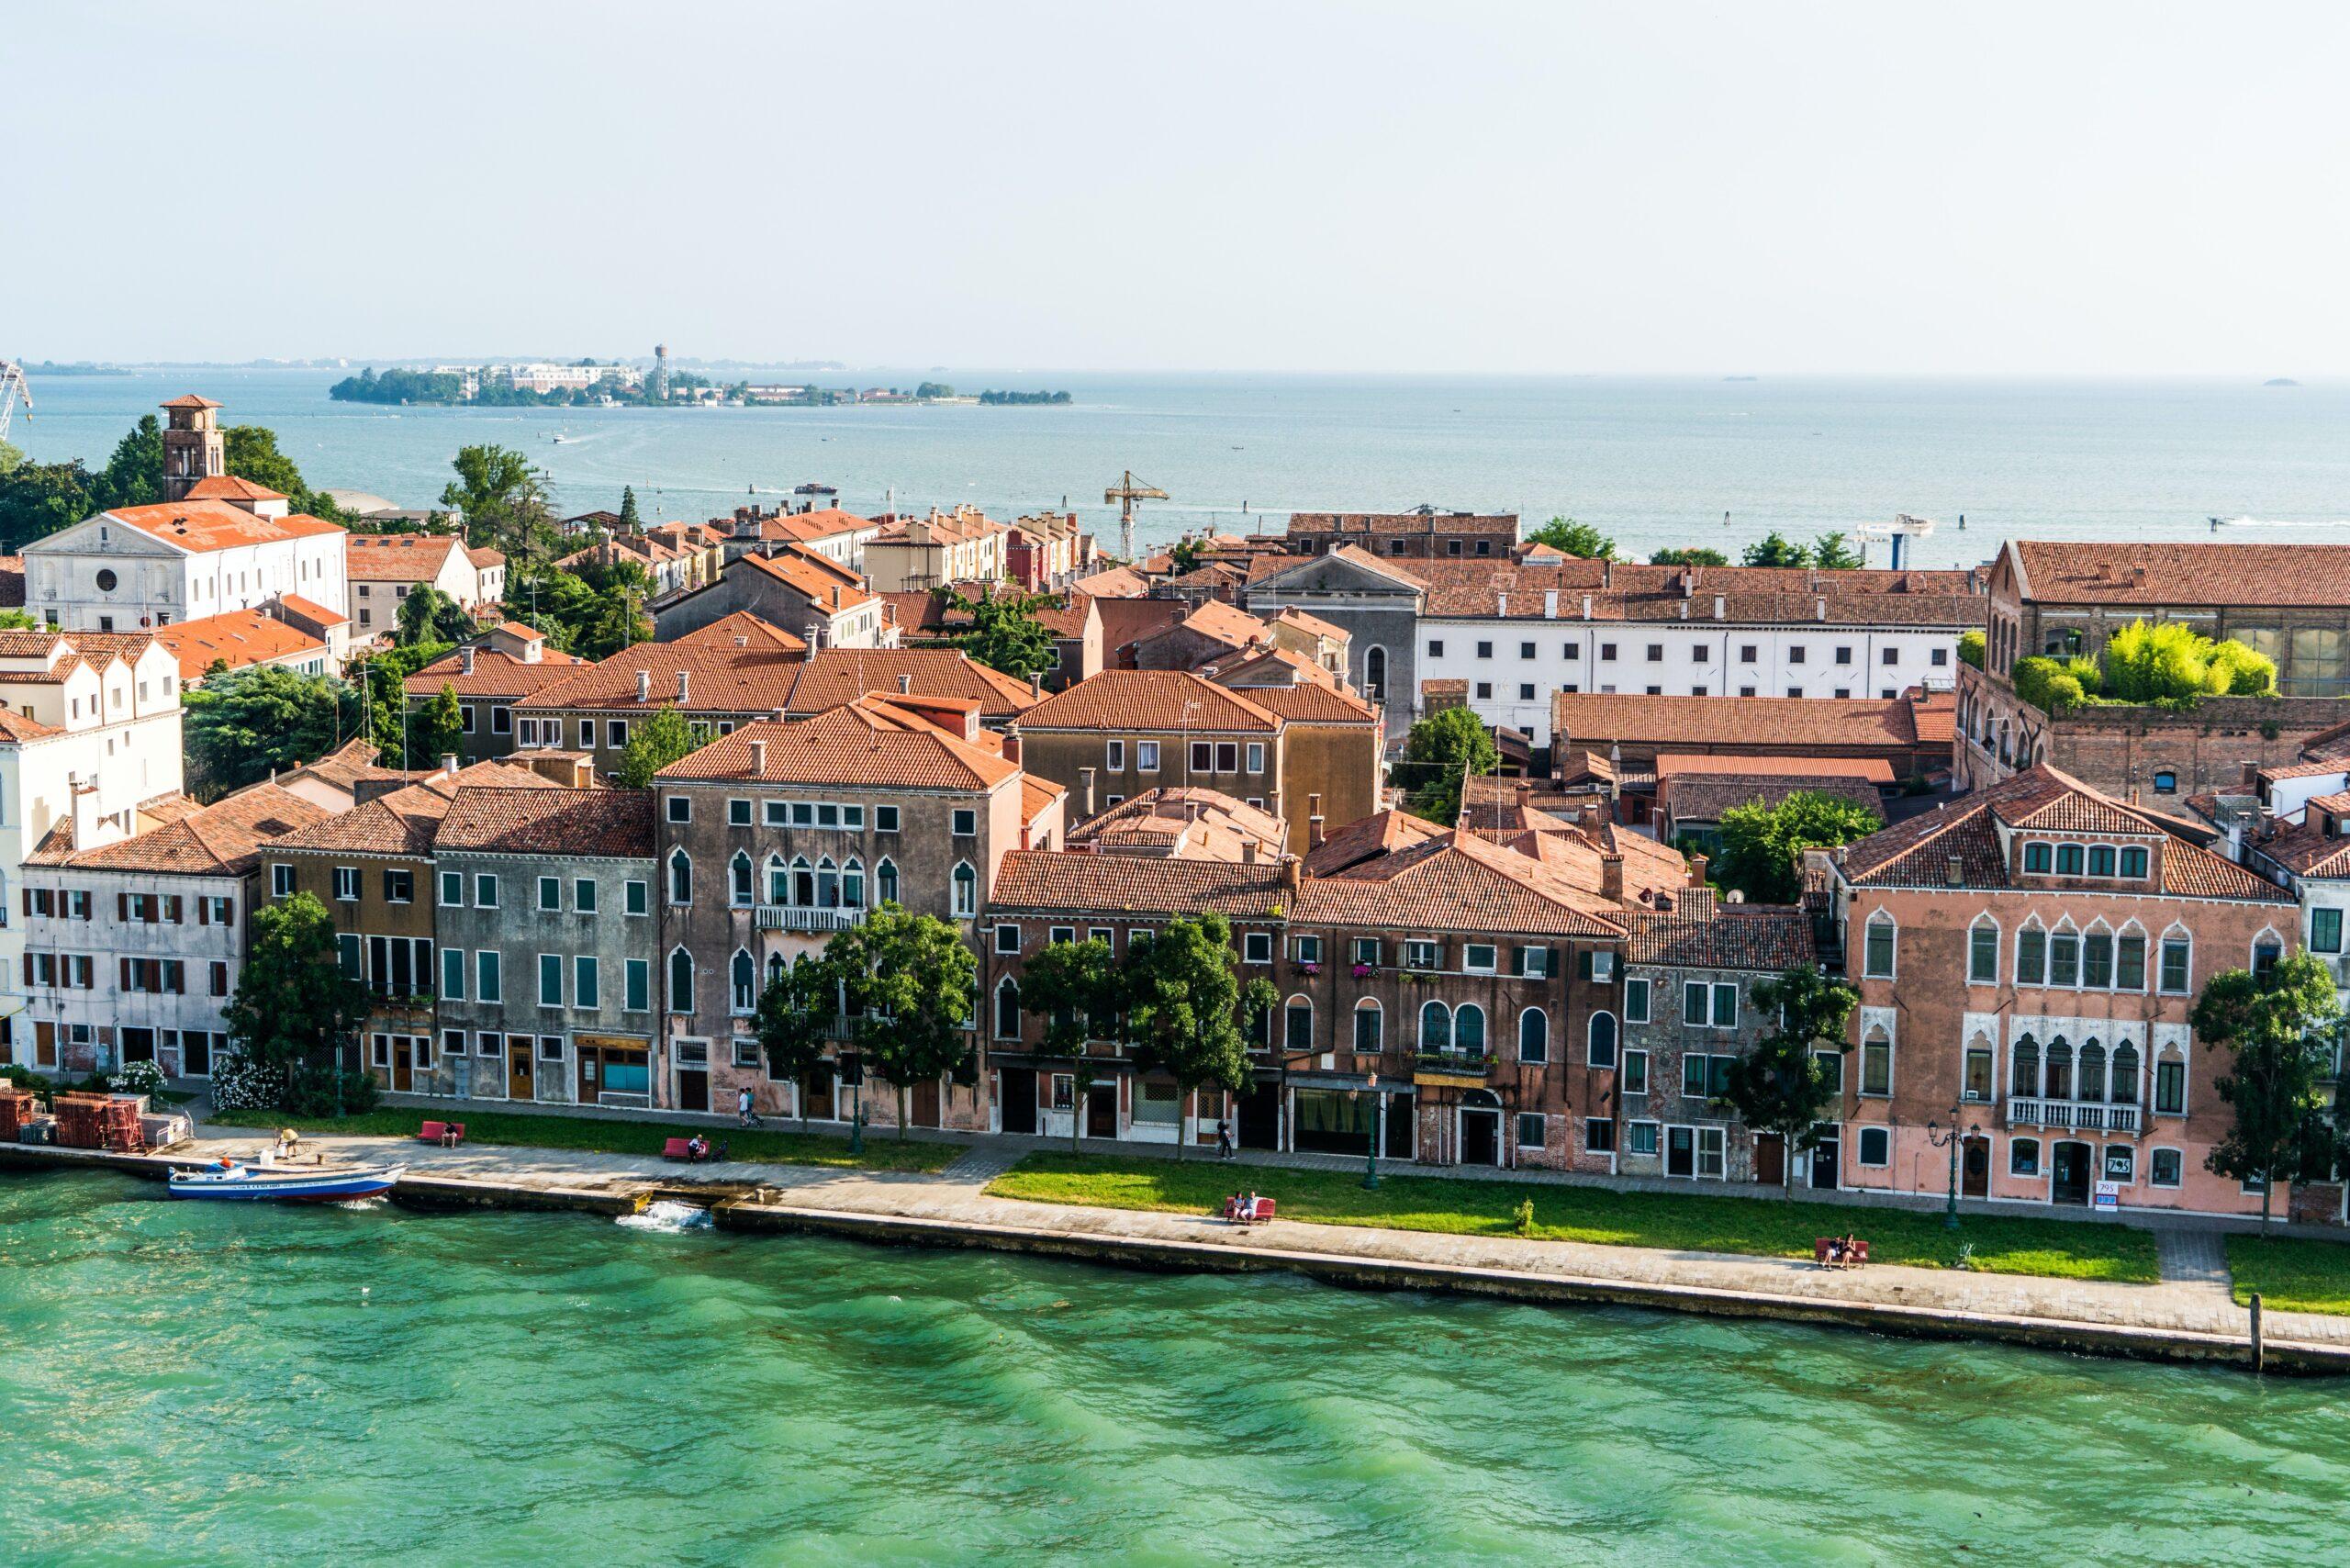 Venezia, la città green